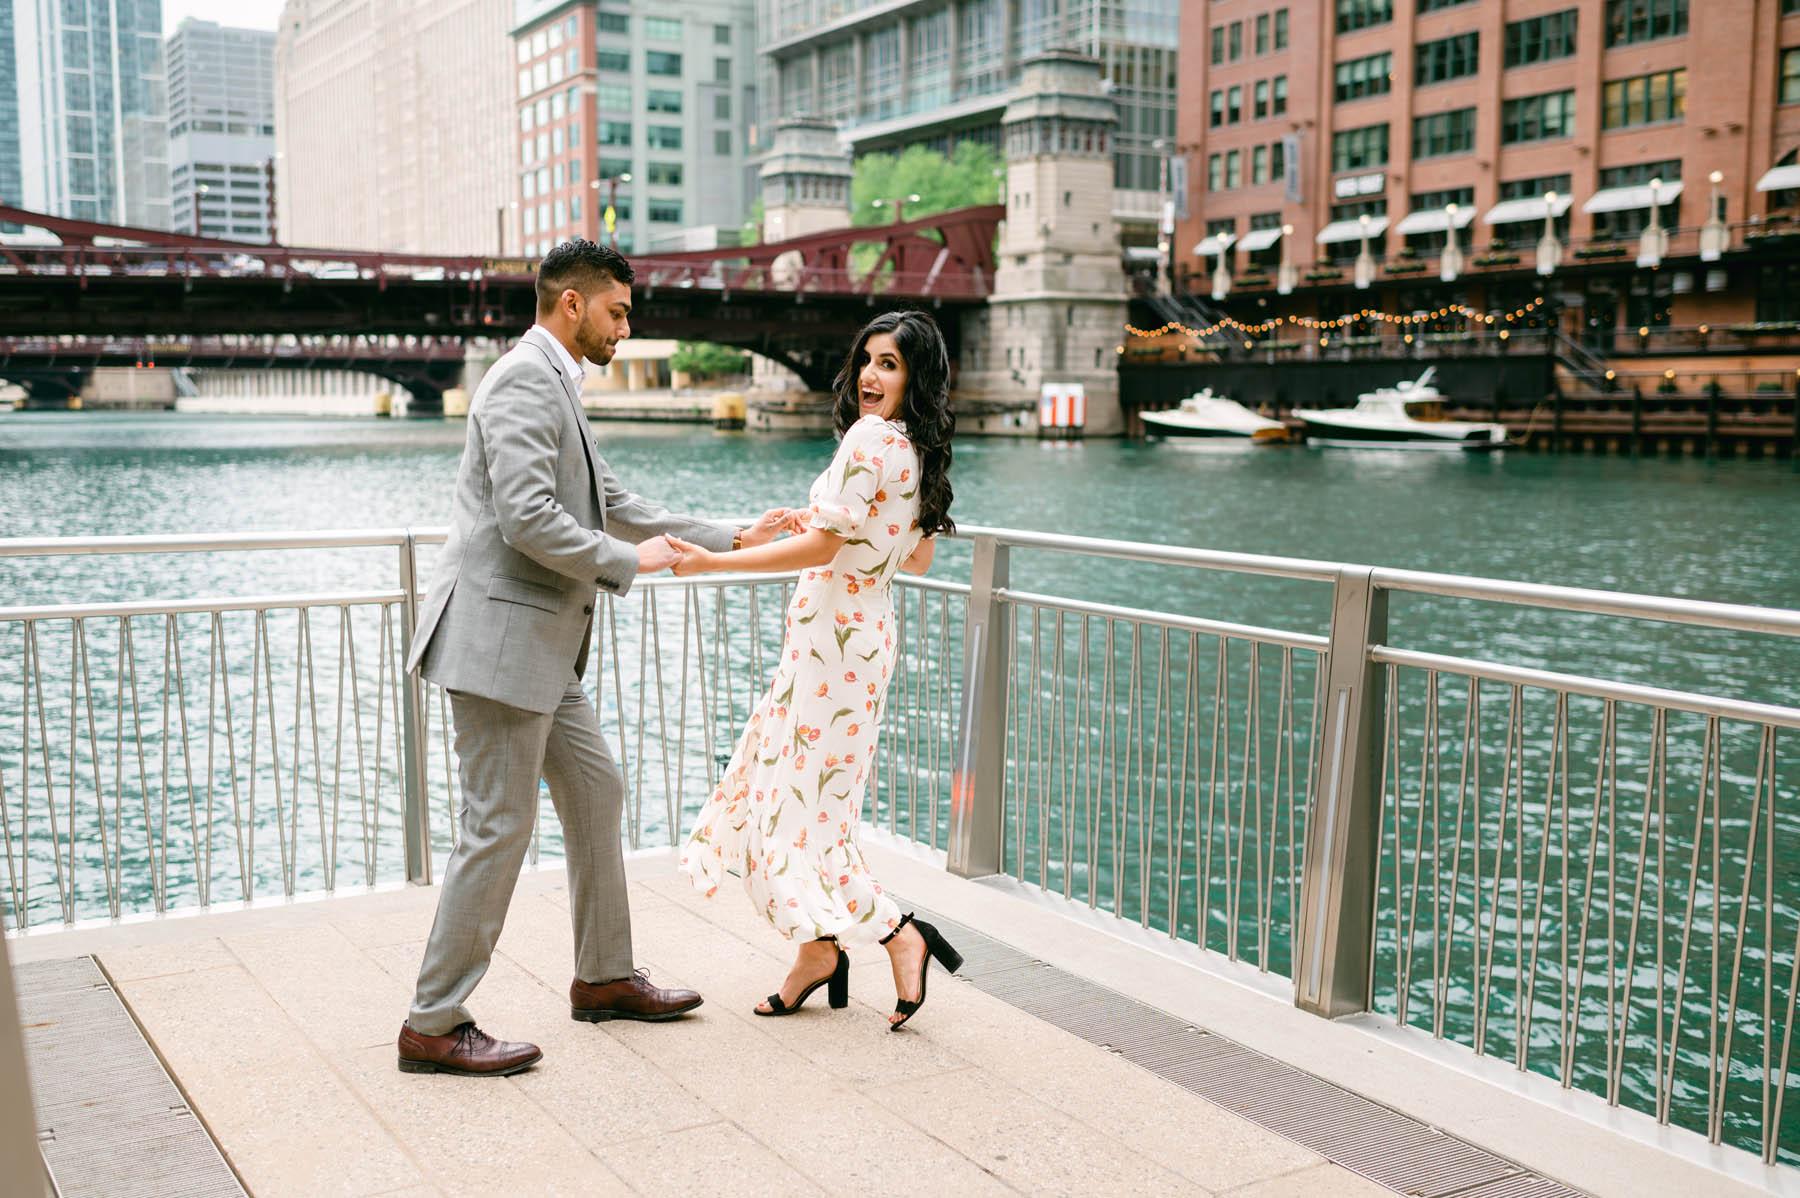 Dancing on the Chicago Riverwalk